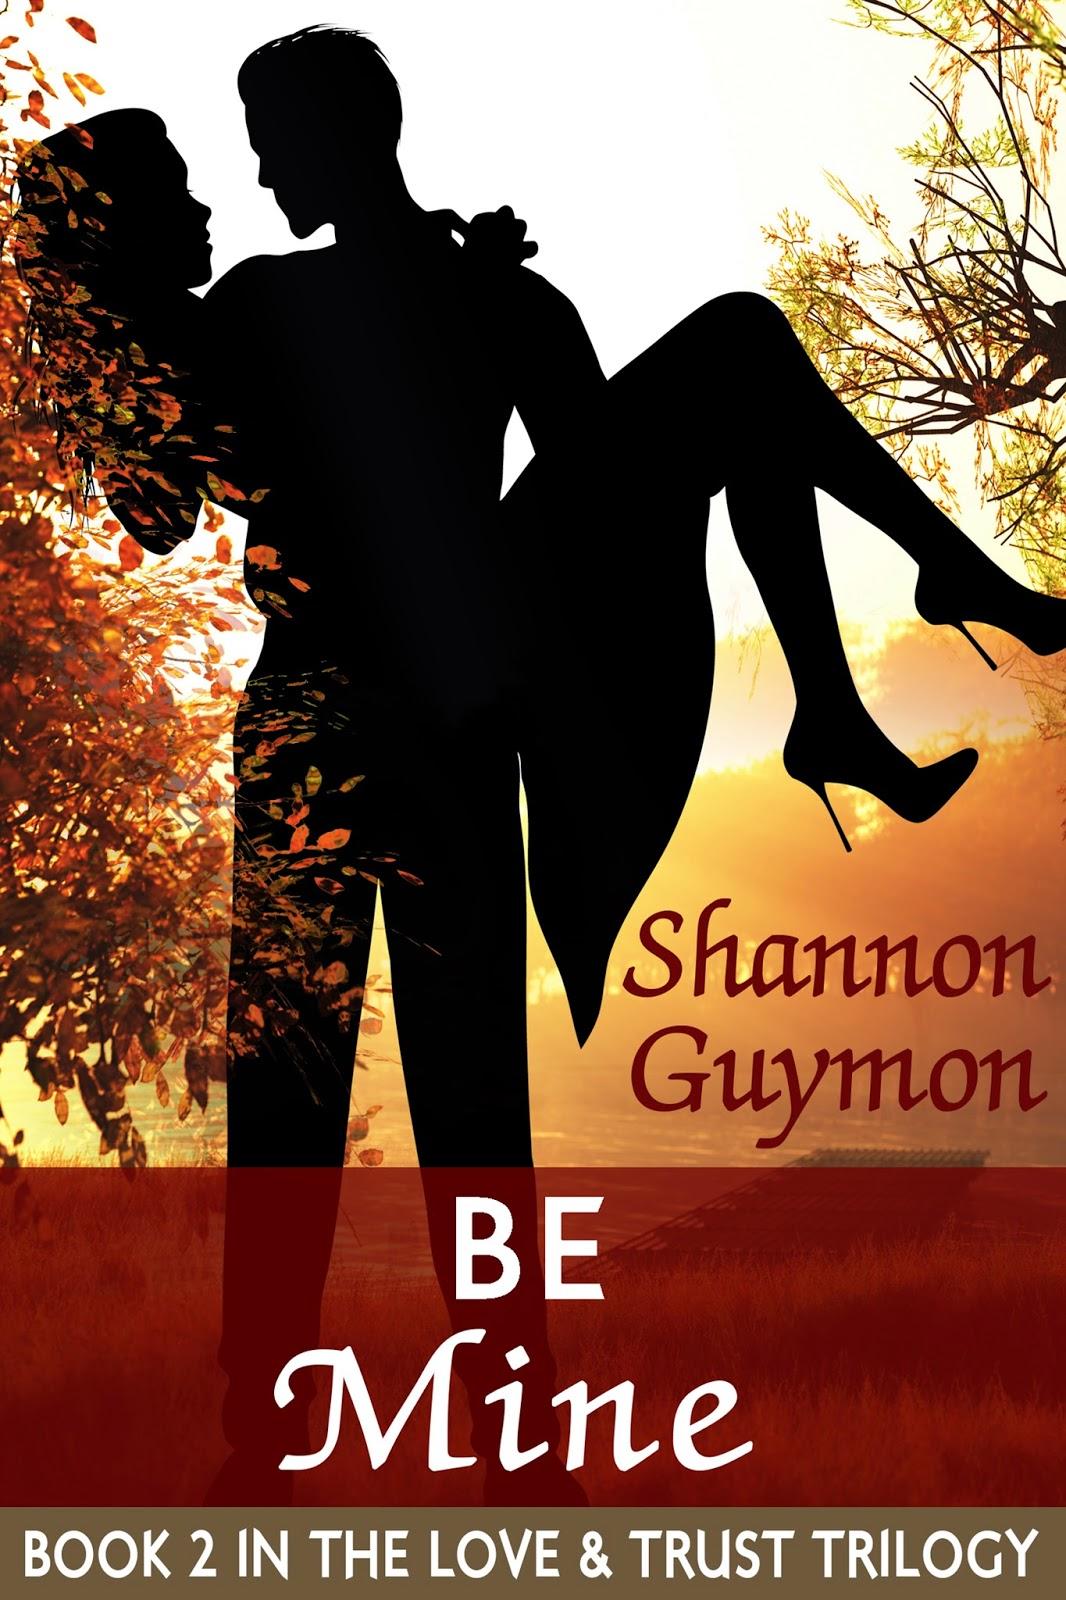 Shannon Guymon ~ Romance Novelist